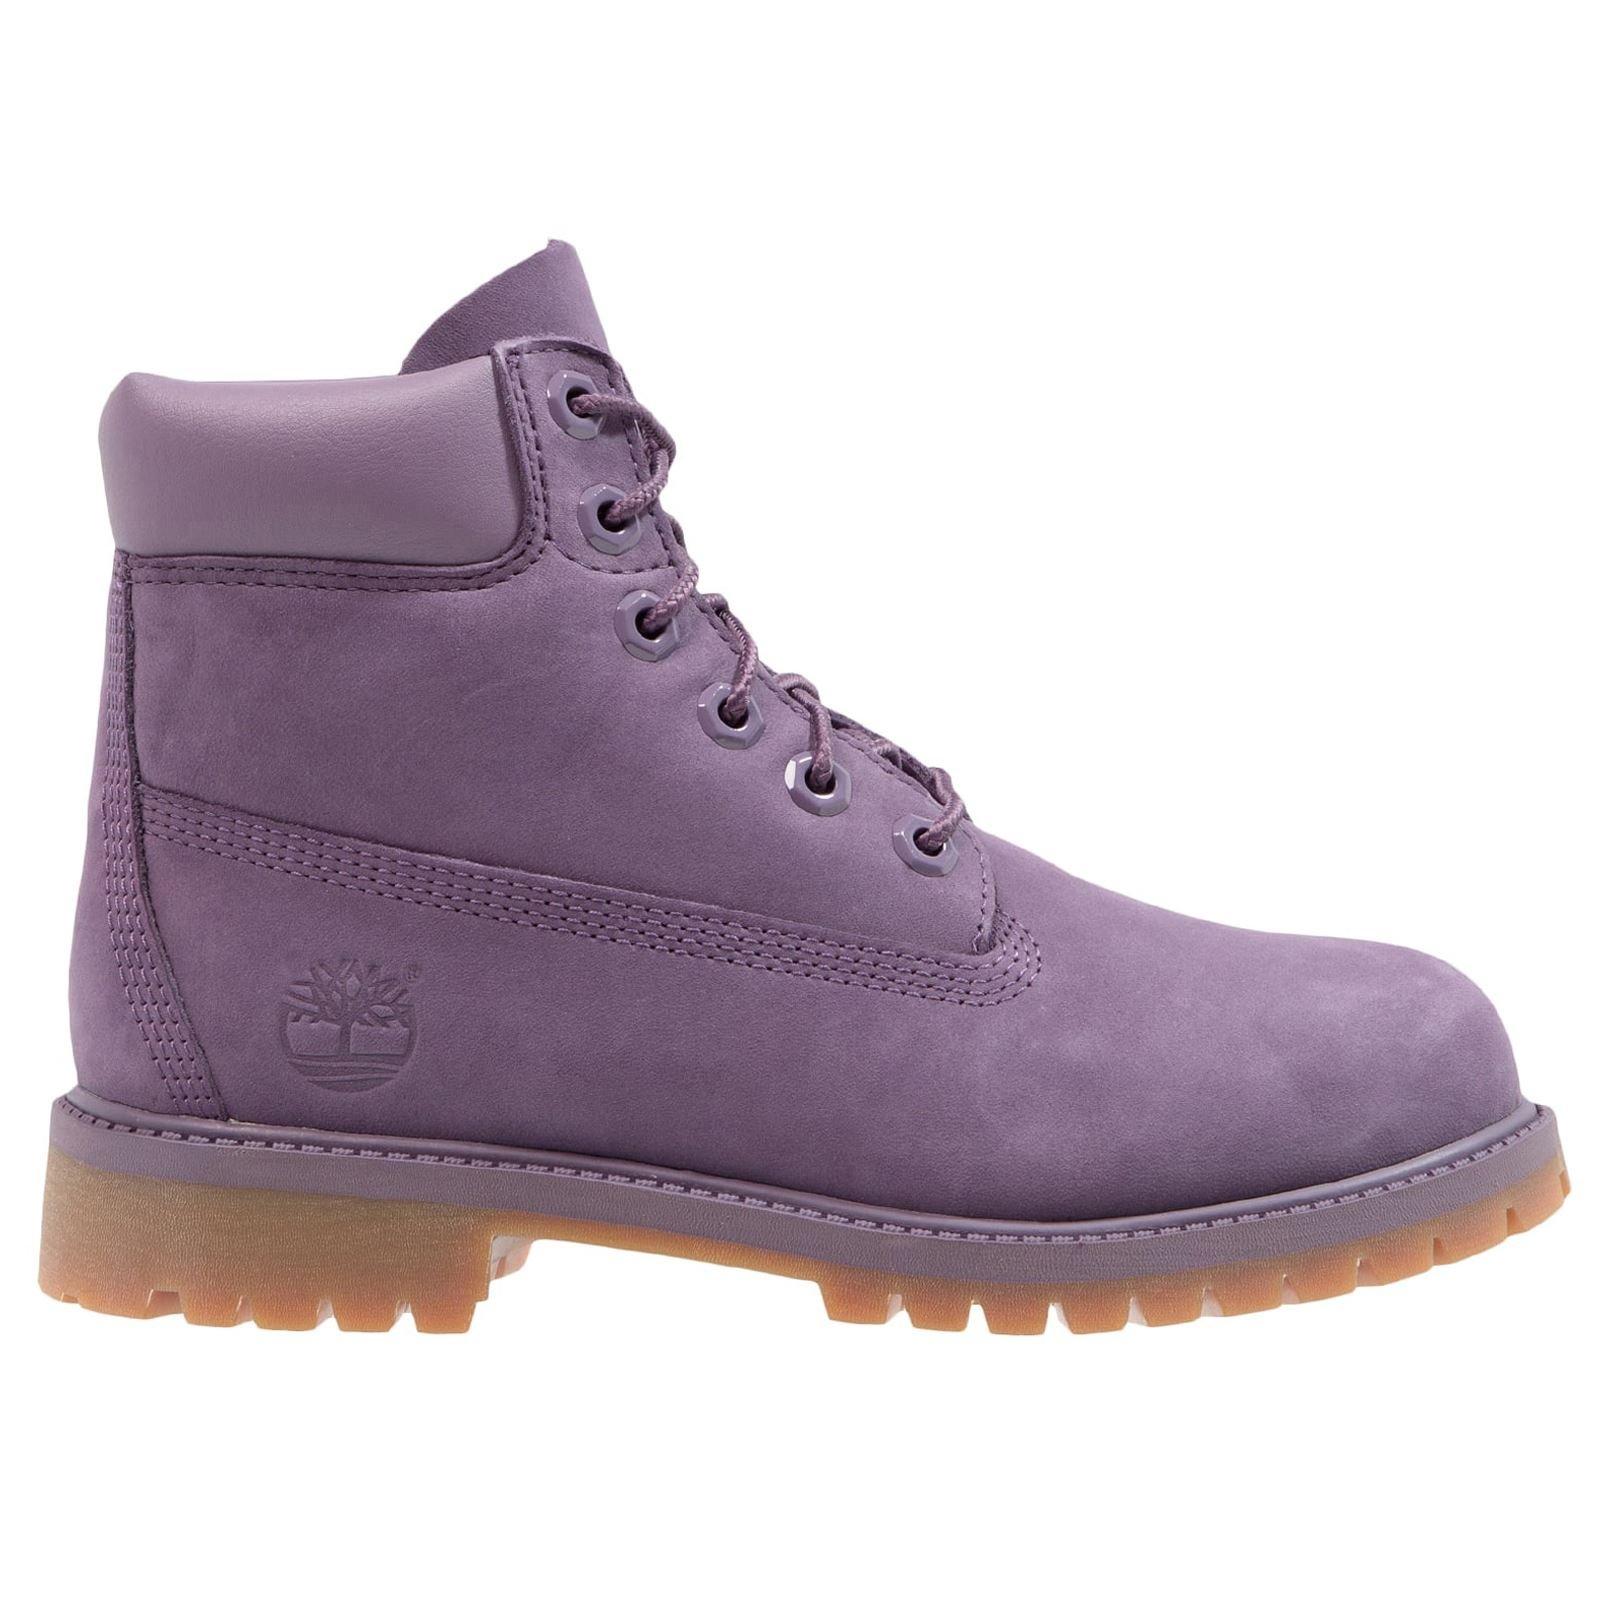 Timberland Youth 6 Inch Premium Waterproof Montana Grape Leather Boots 7 US